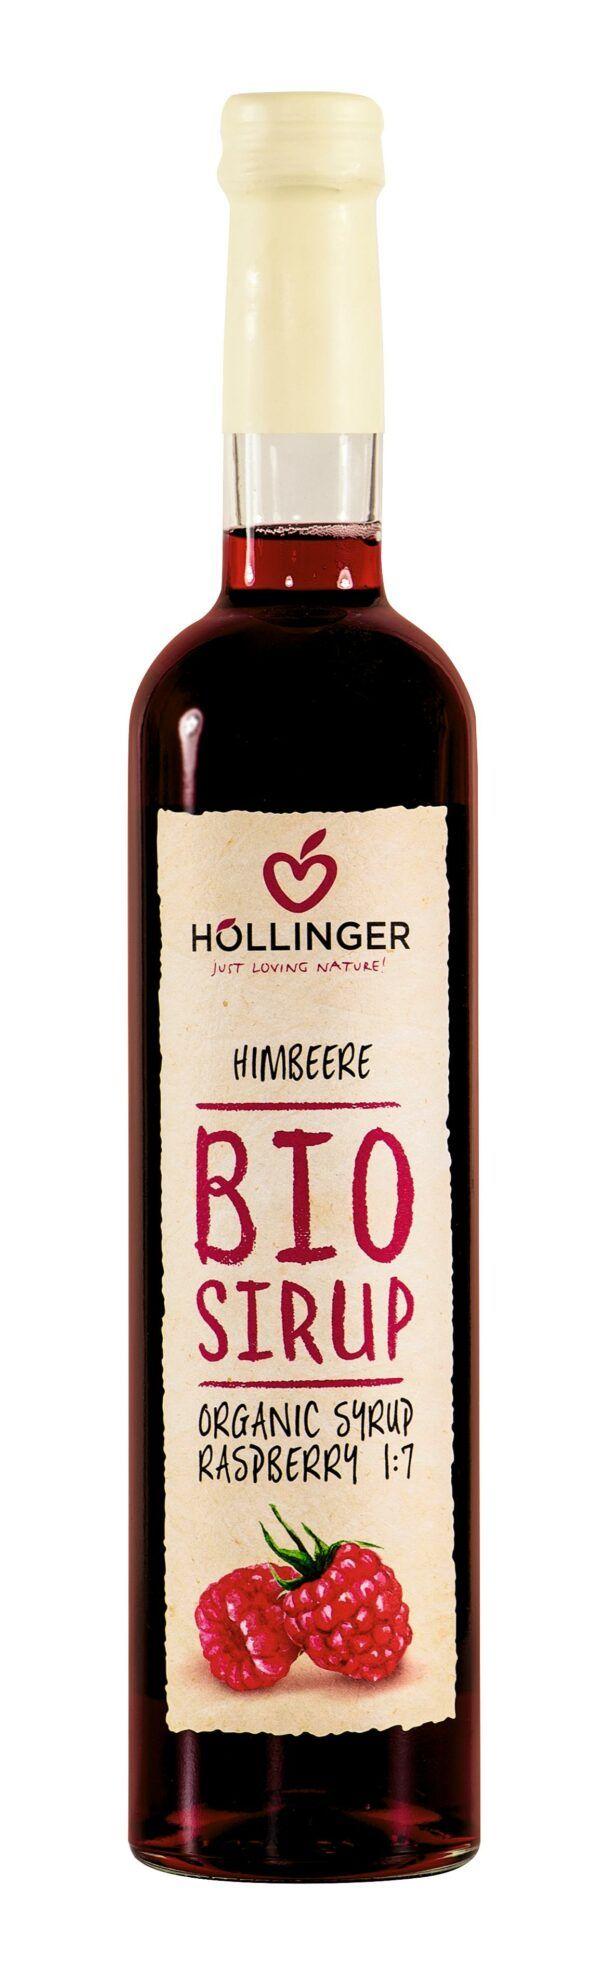 IMS Höllinger Bio Himbeer Sirup 0,5l Glass Flasche 6x500ml